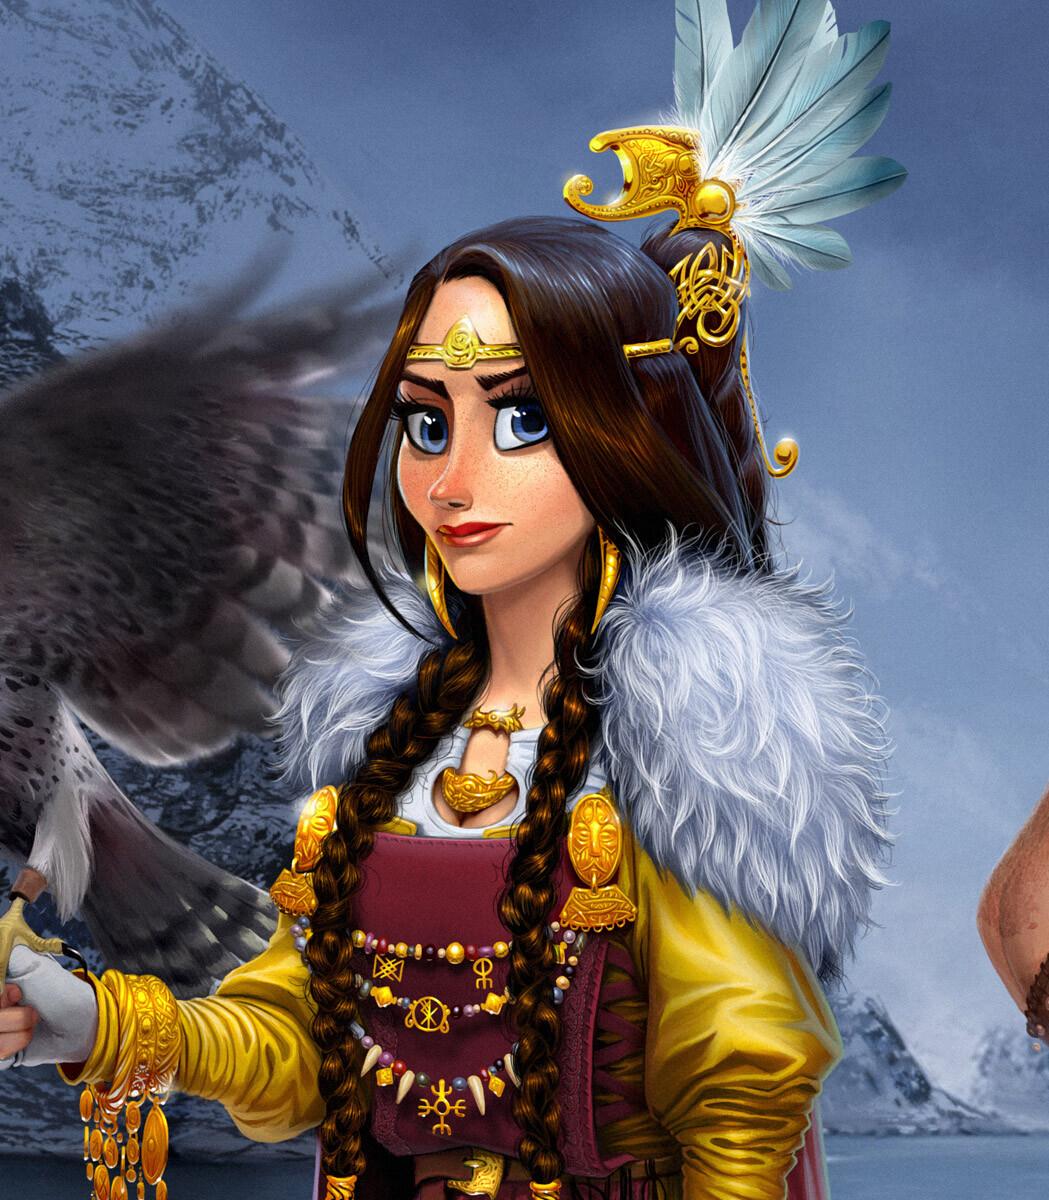 The goddess Frigg